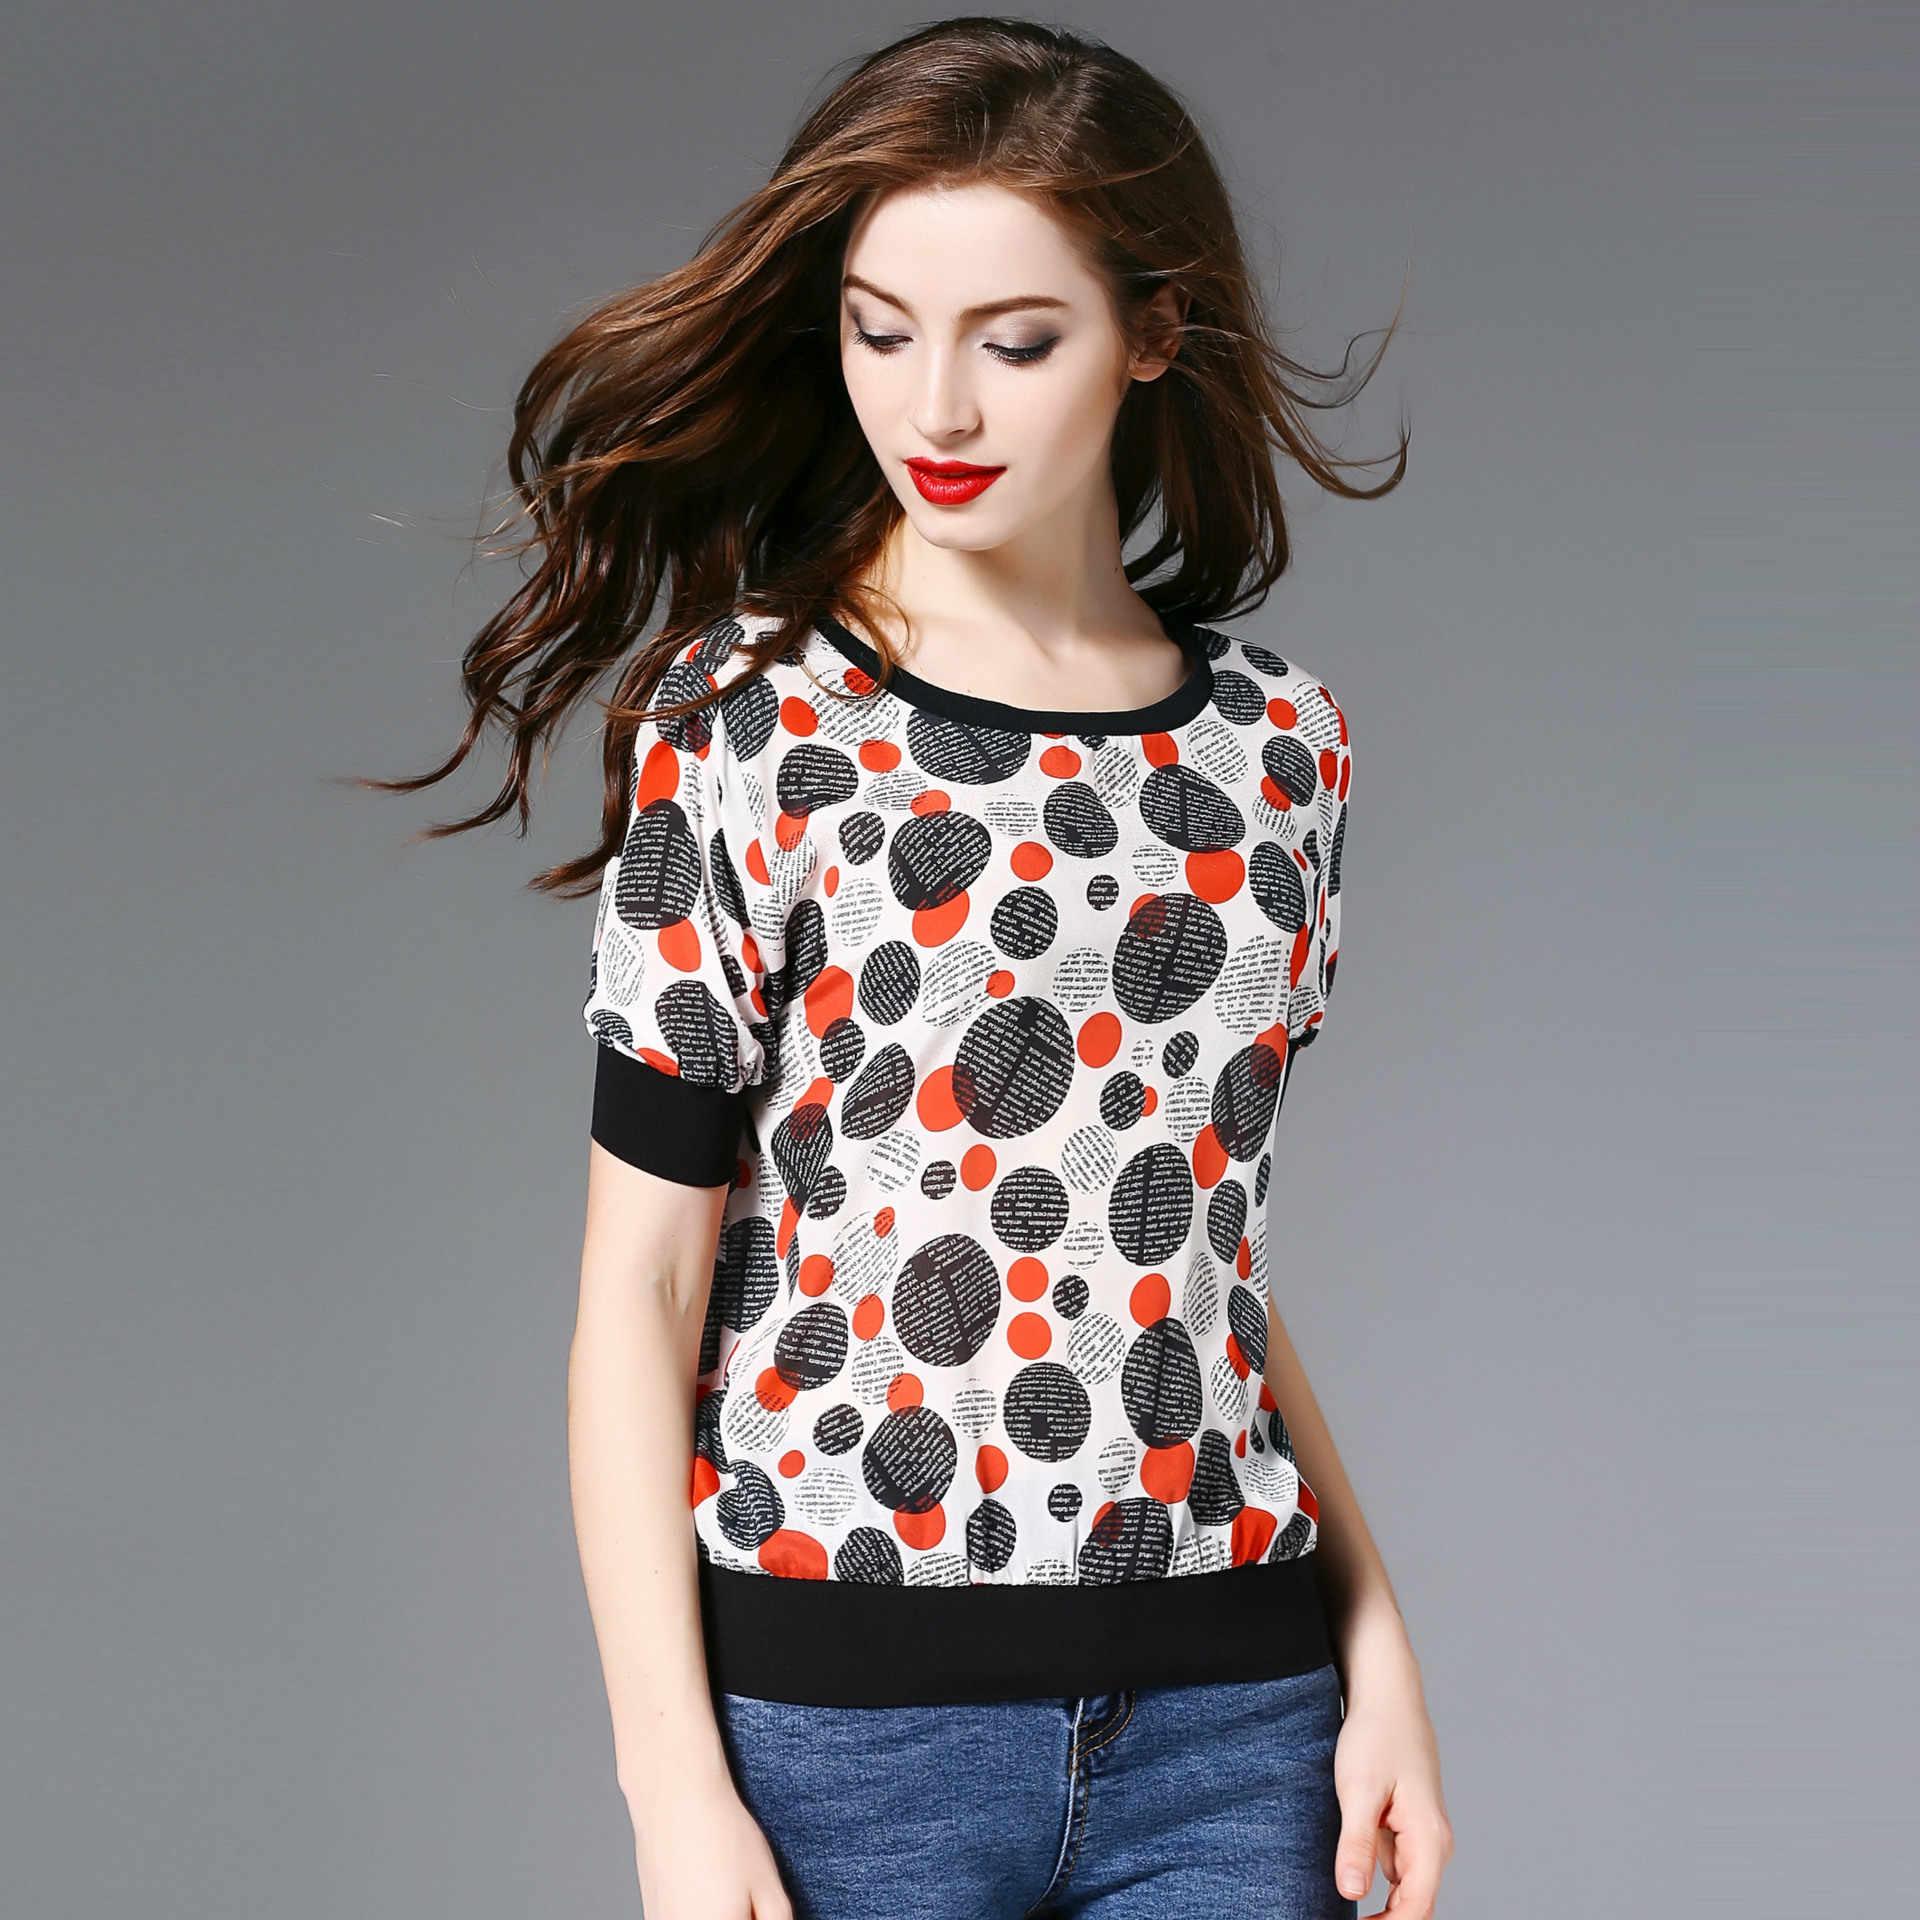 2018 Elegant Commuting WOMEN'S Dress Ozhouzhan Women's Floral Dotted Short Sleeve Real Silk T-shirt Upper-wear for Women